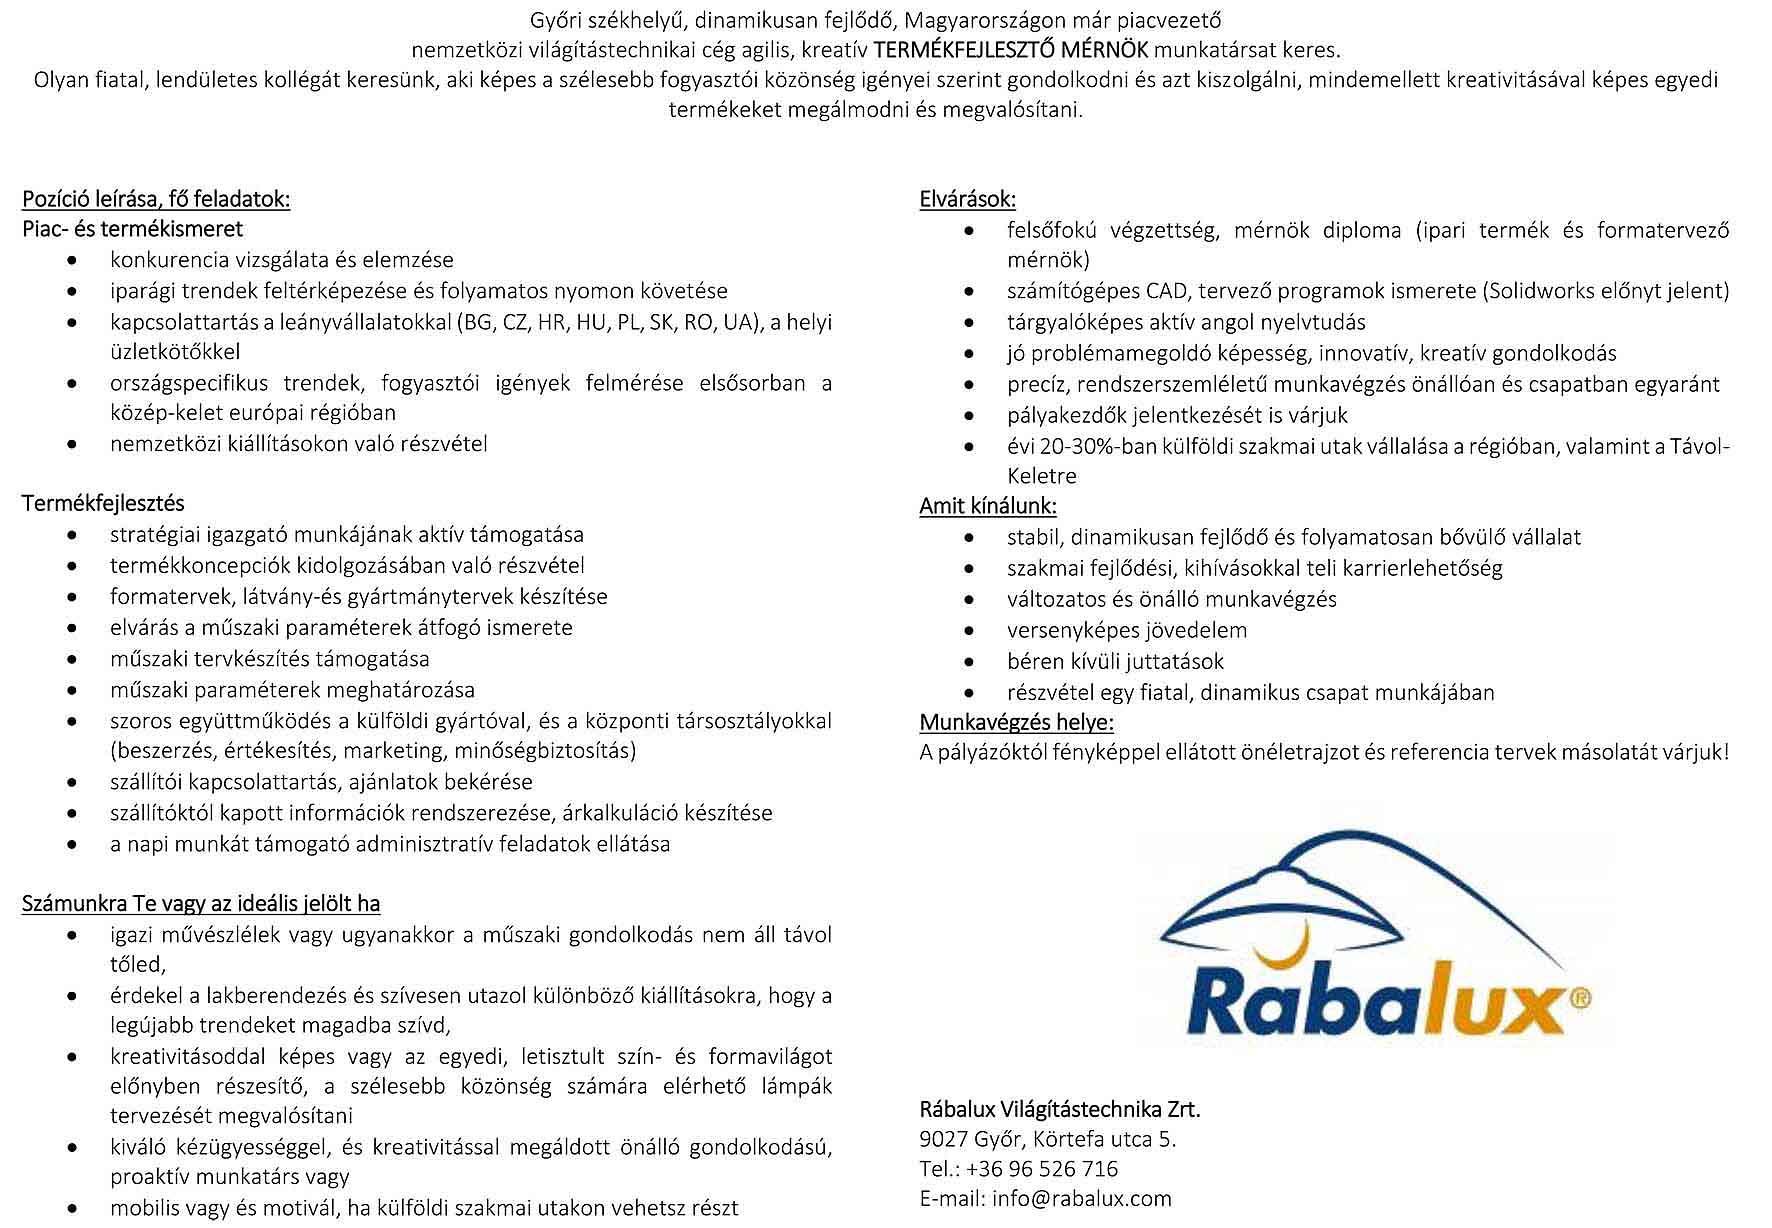 _20170919_Rabalux_Termekfejleszto-2_